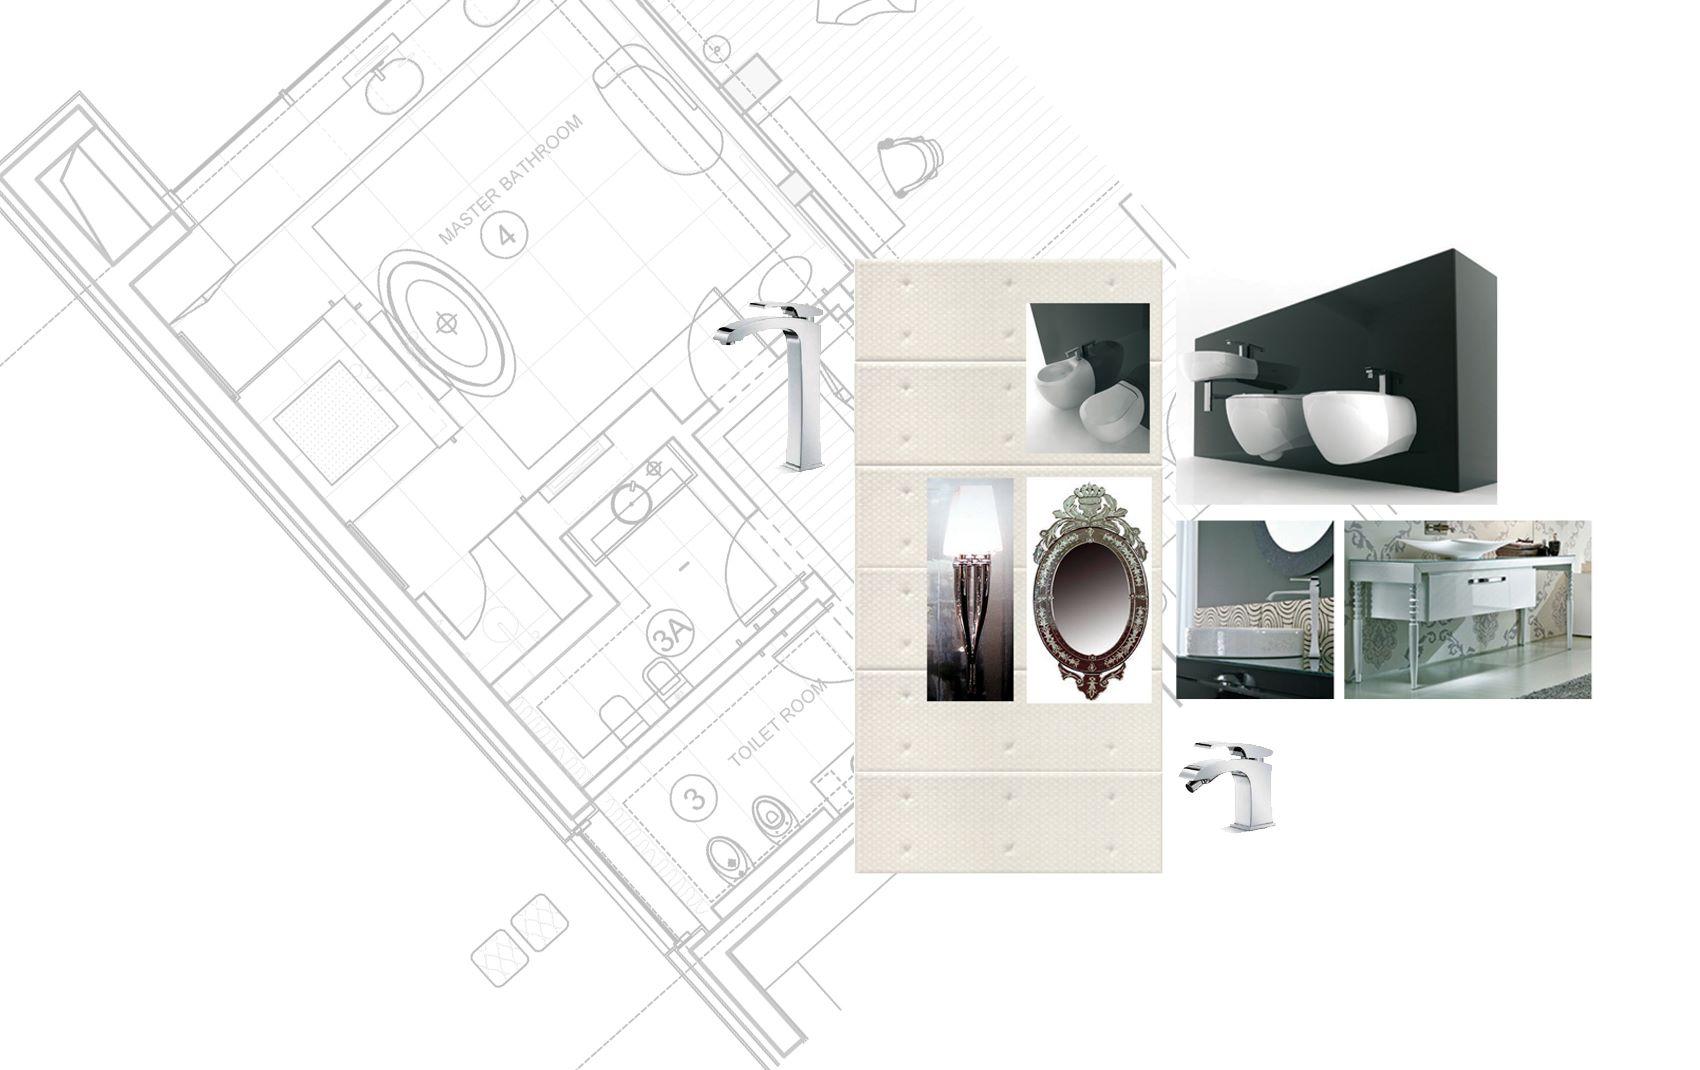 moscow villa - UK Luxury Designer Bathroom Showcase